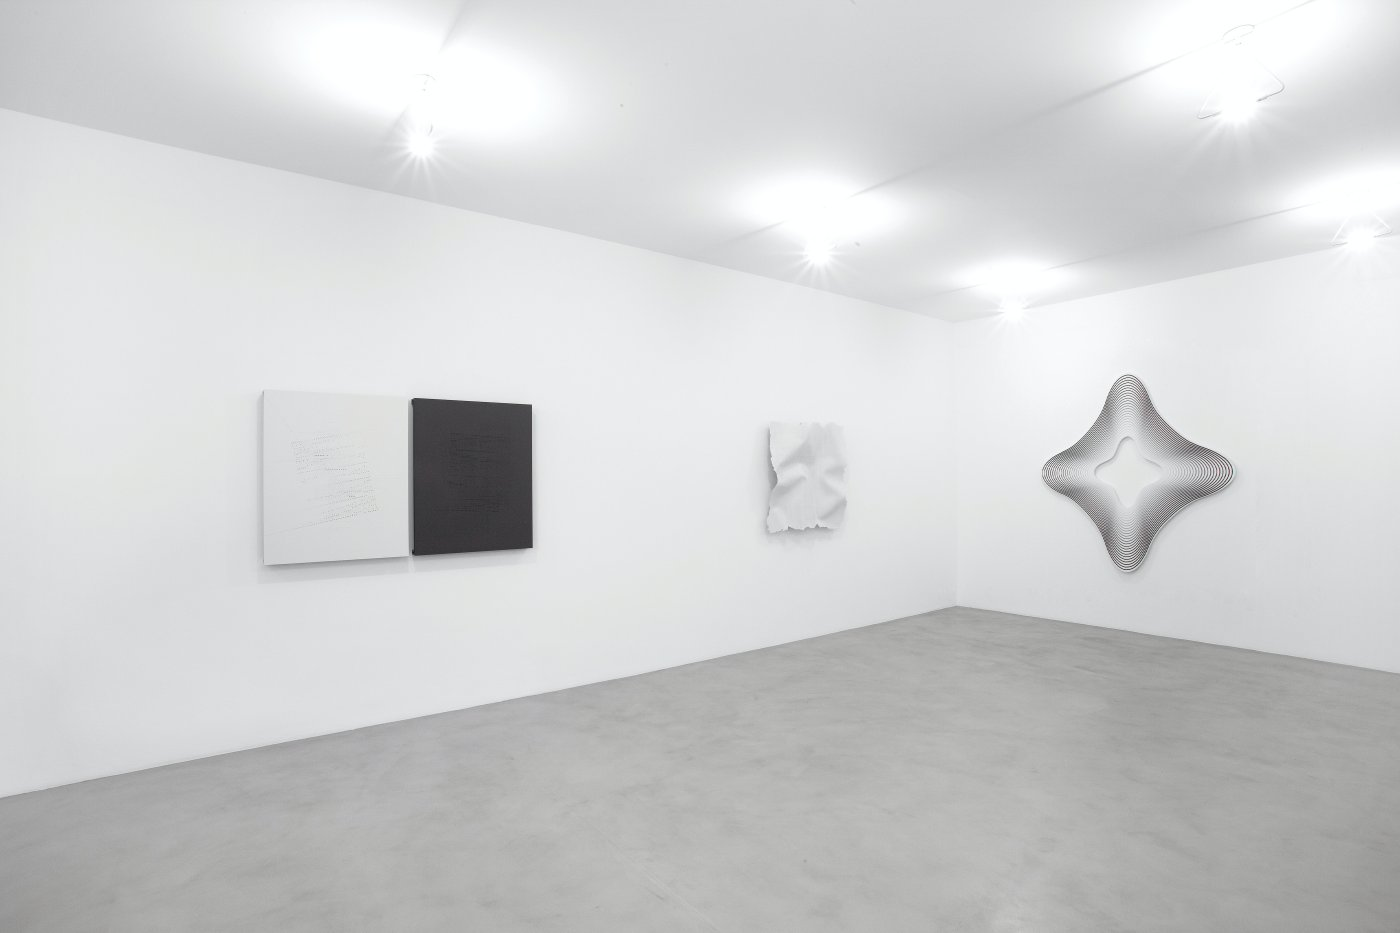 A Arte Invernizzi Sensitive spaces 2